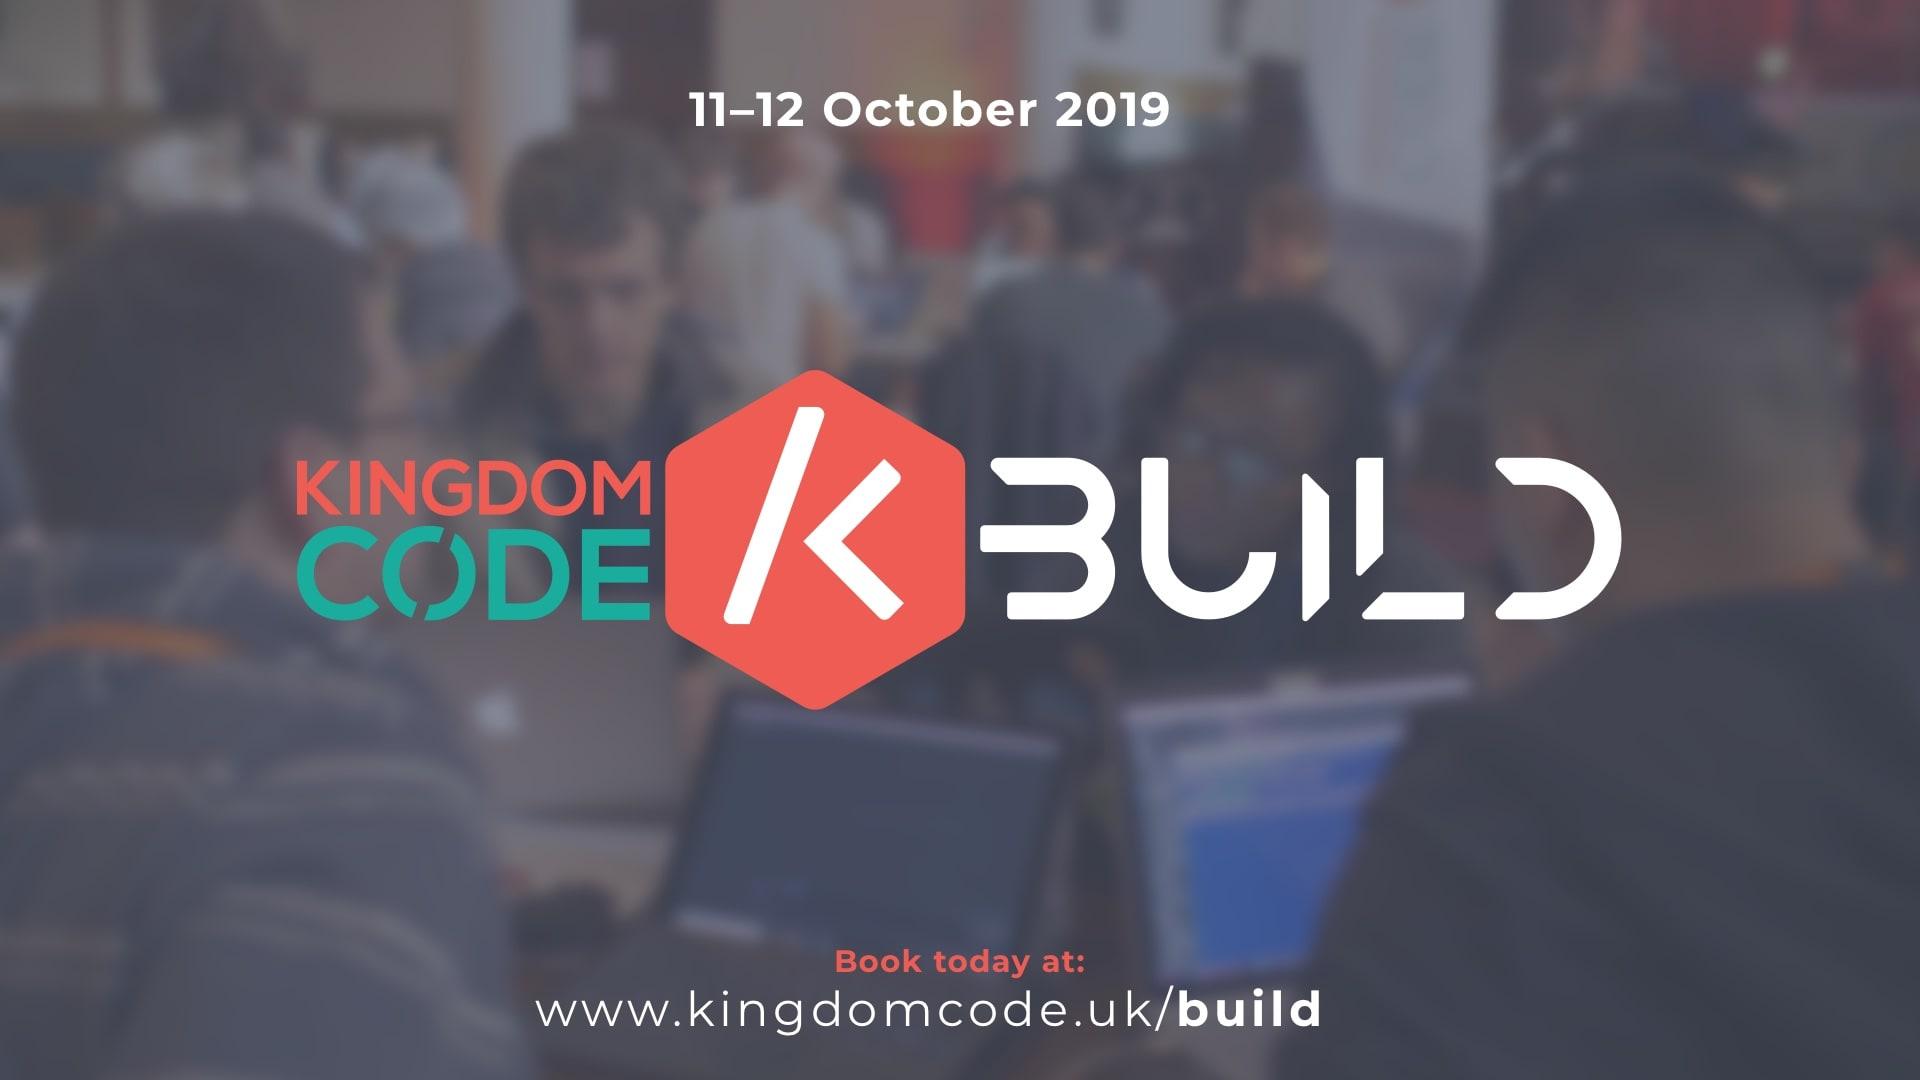 Kingdom Code Build 2019